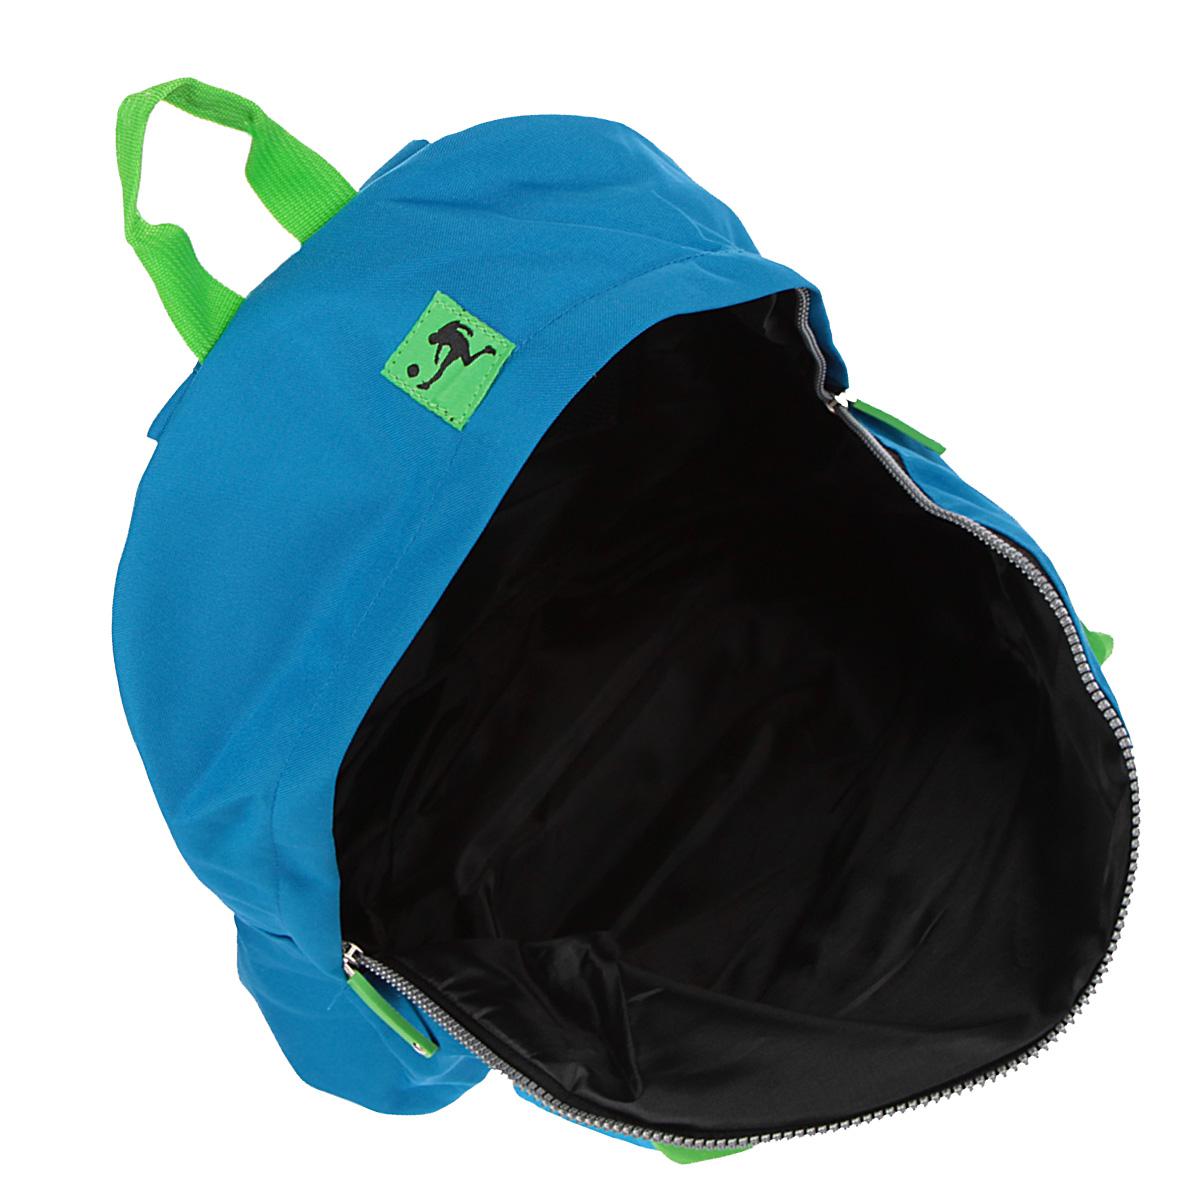 "Рюкзак Erich Krause ""Soccer"", цвет: синий, зеленый"